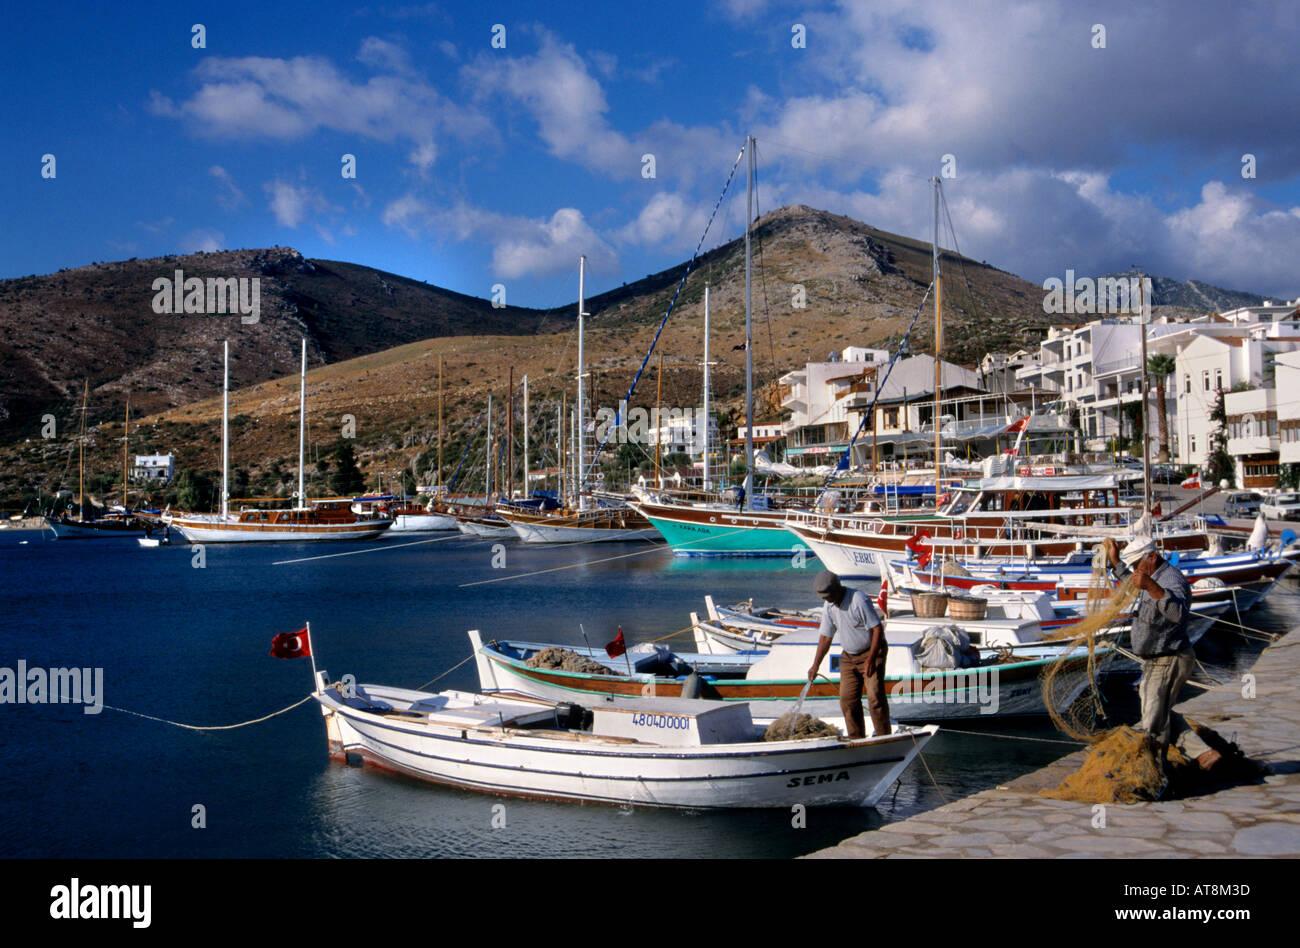 Datca Turkish Turkey port harbor boat vessel - Stock Image